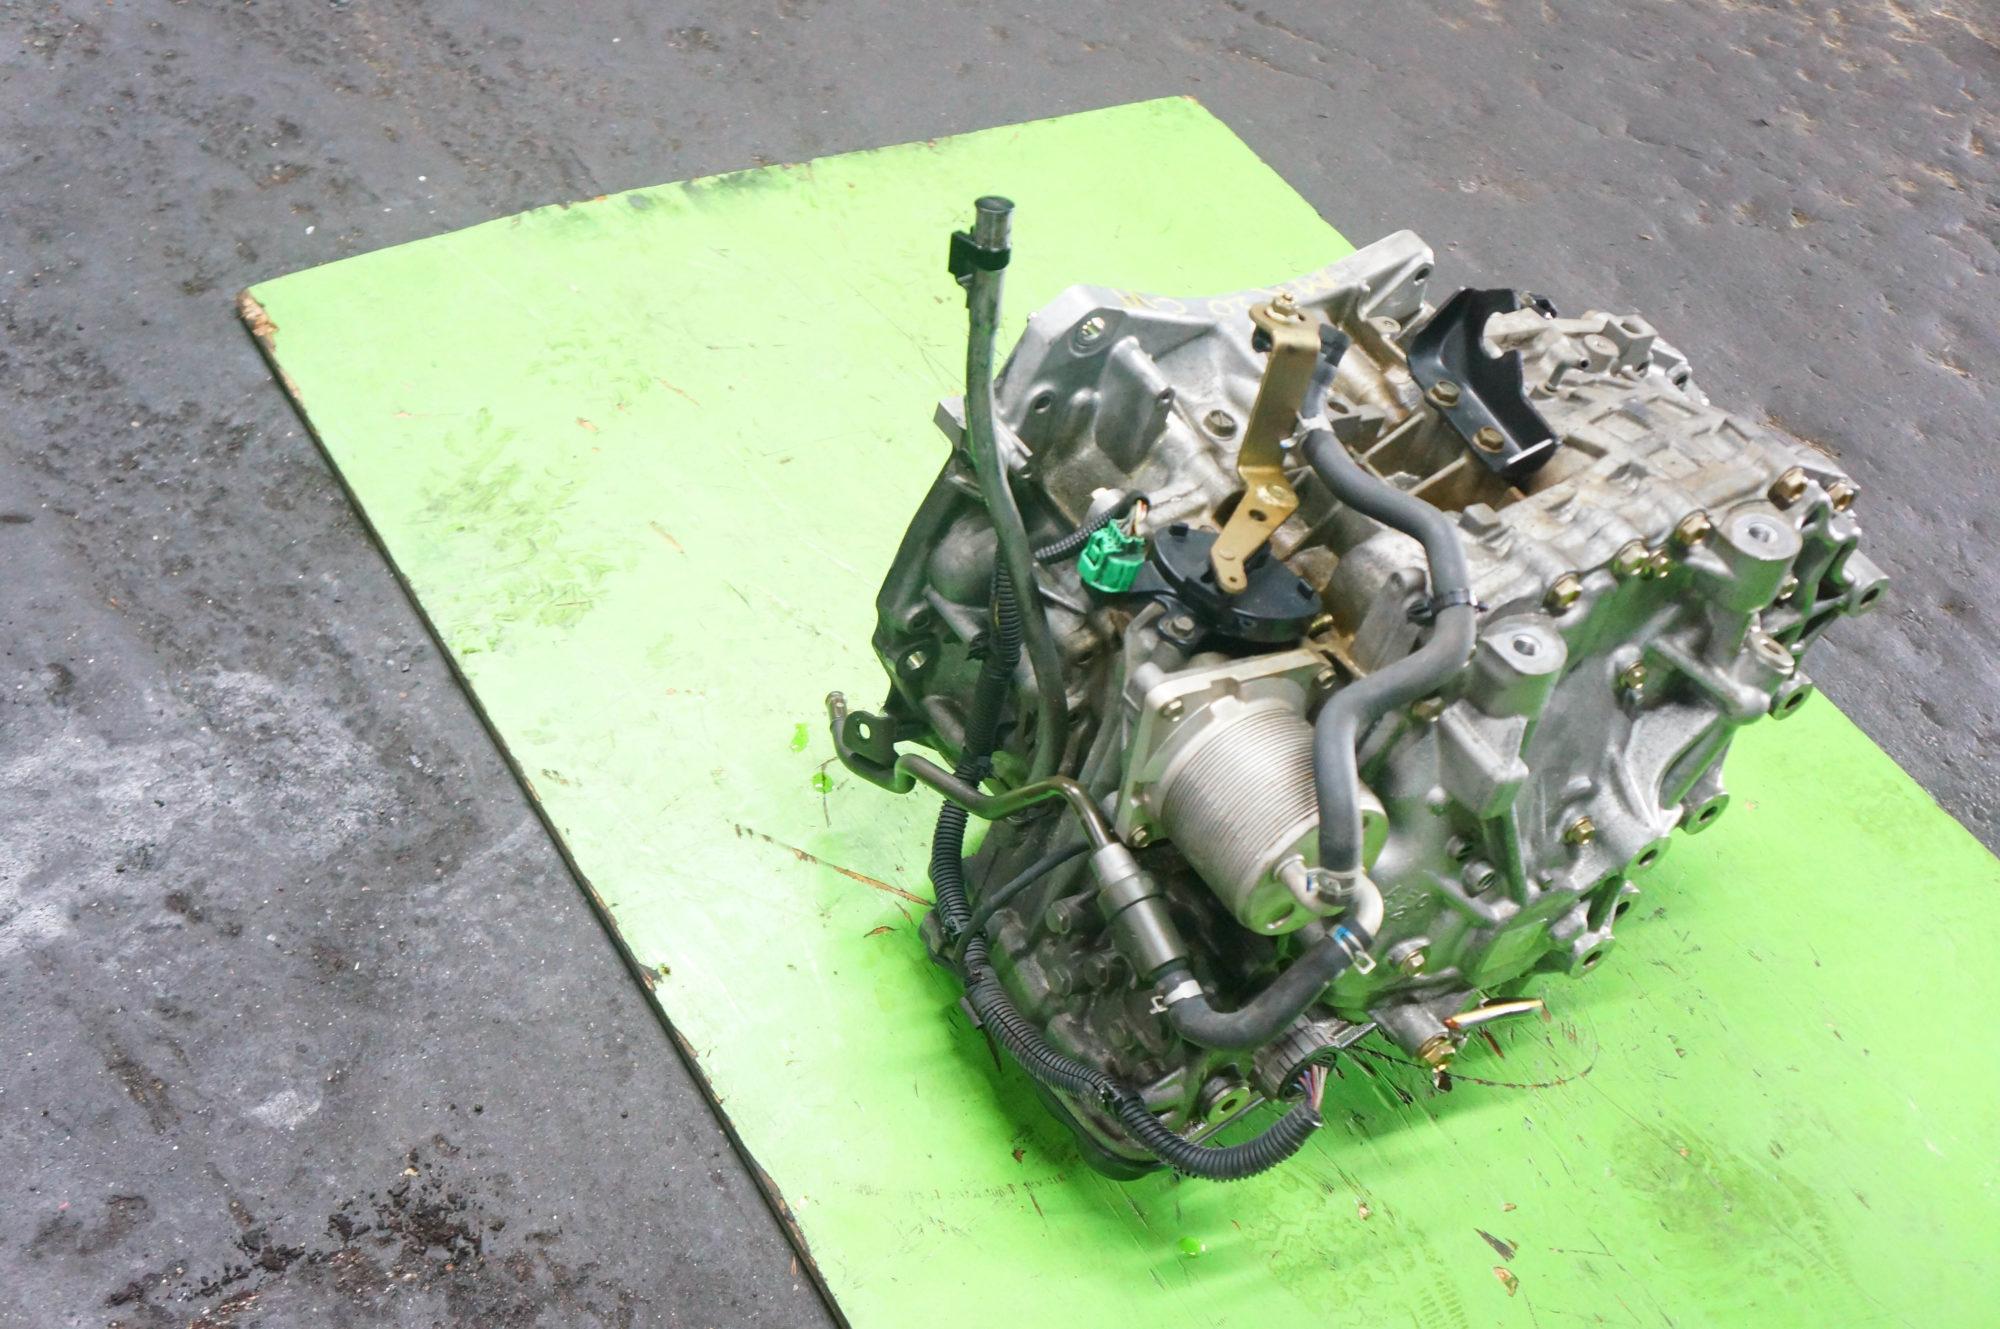 JDM 2007-2012 NISSAN SENTRA MR20DE 2.0L CVT AUTOMATIC TRANSMISSION